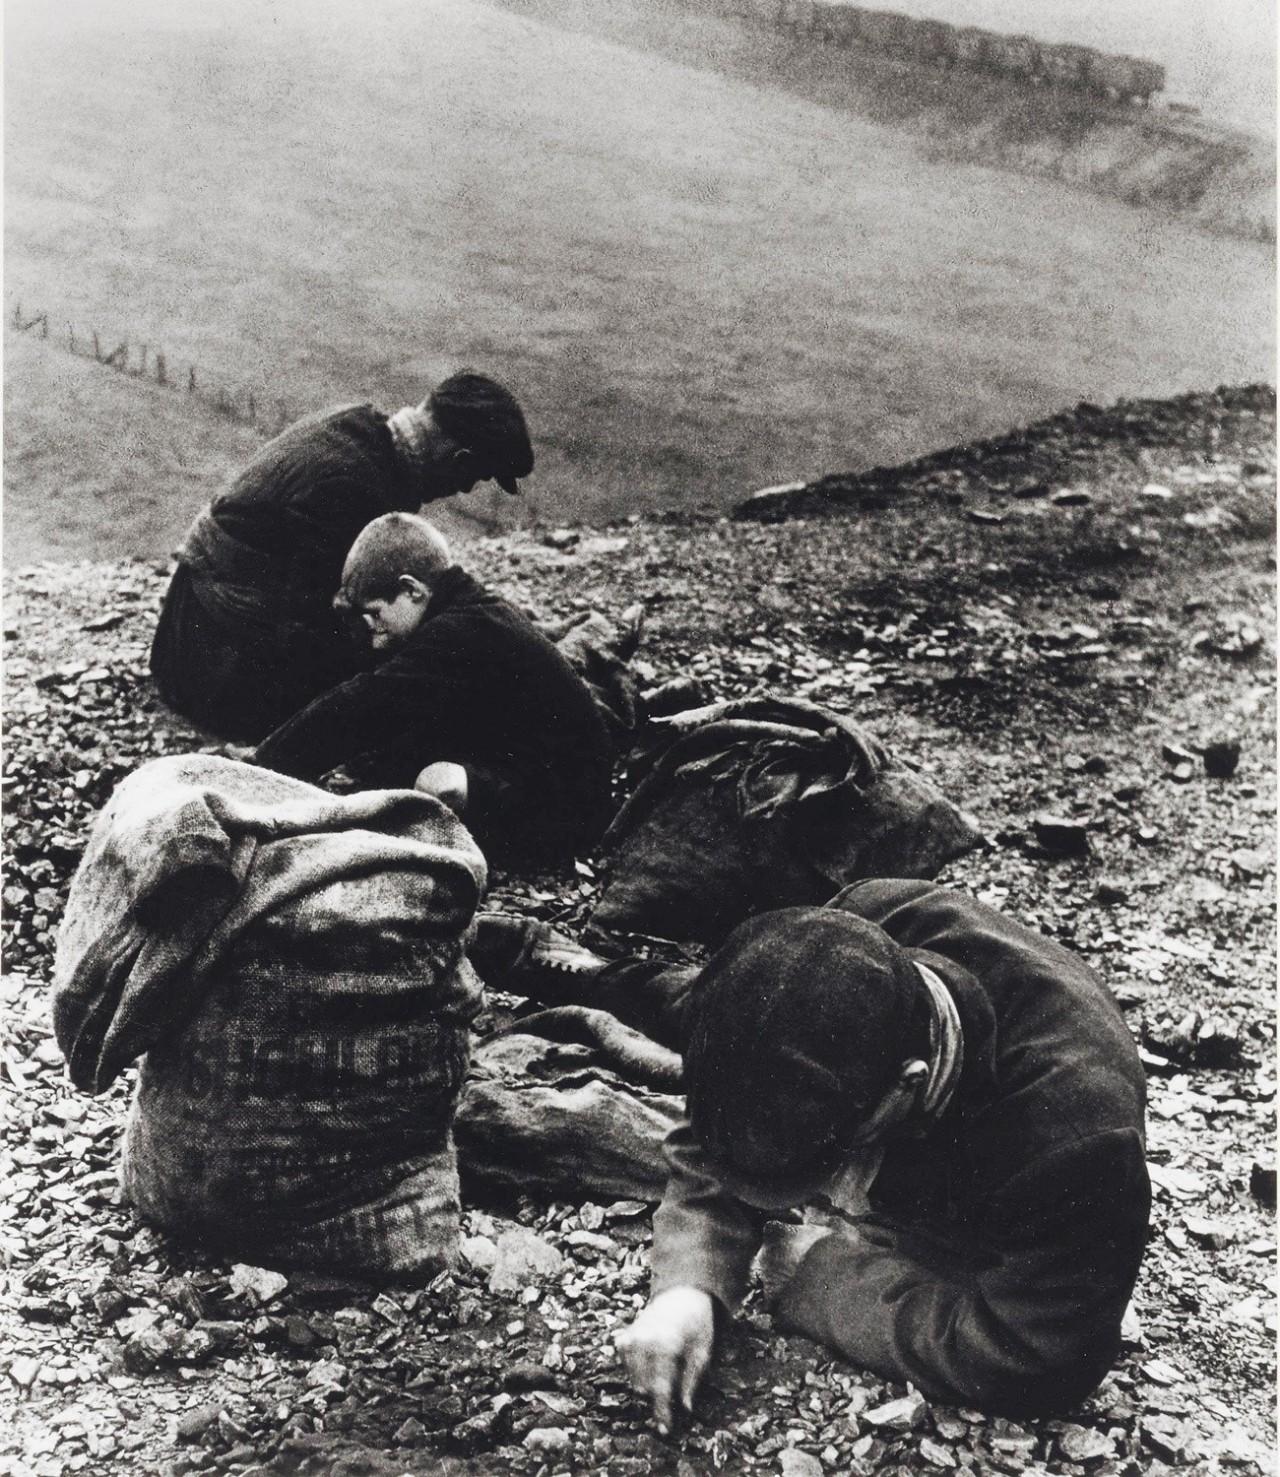 Собиратели угля, около 1936-1937. Фотограф Билл Брандт